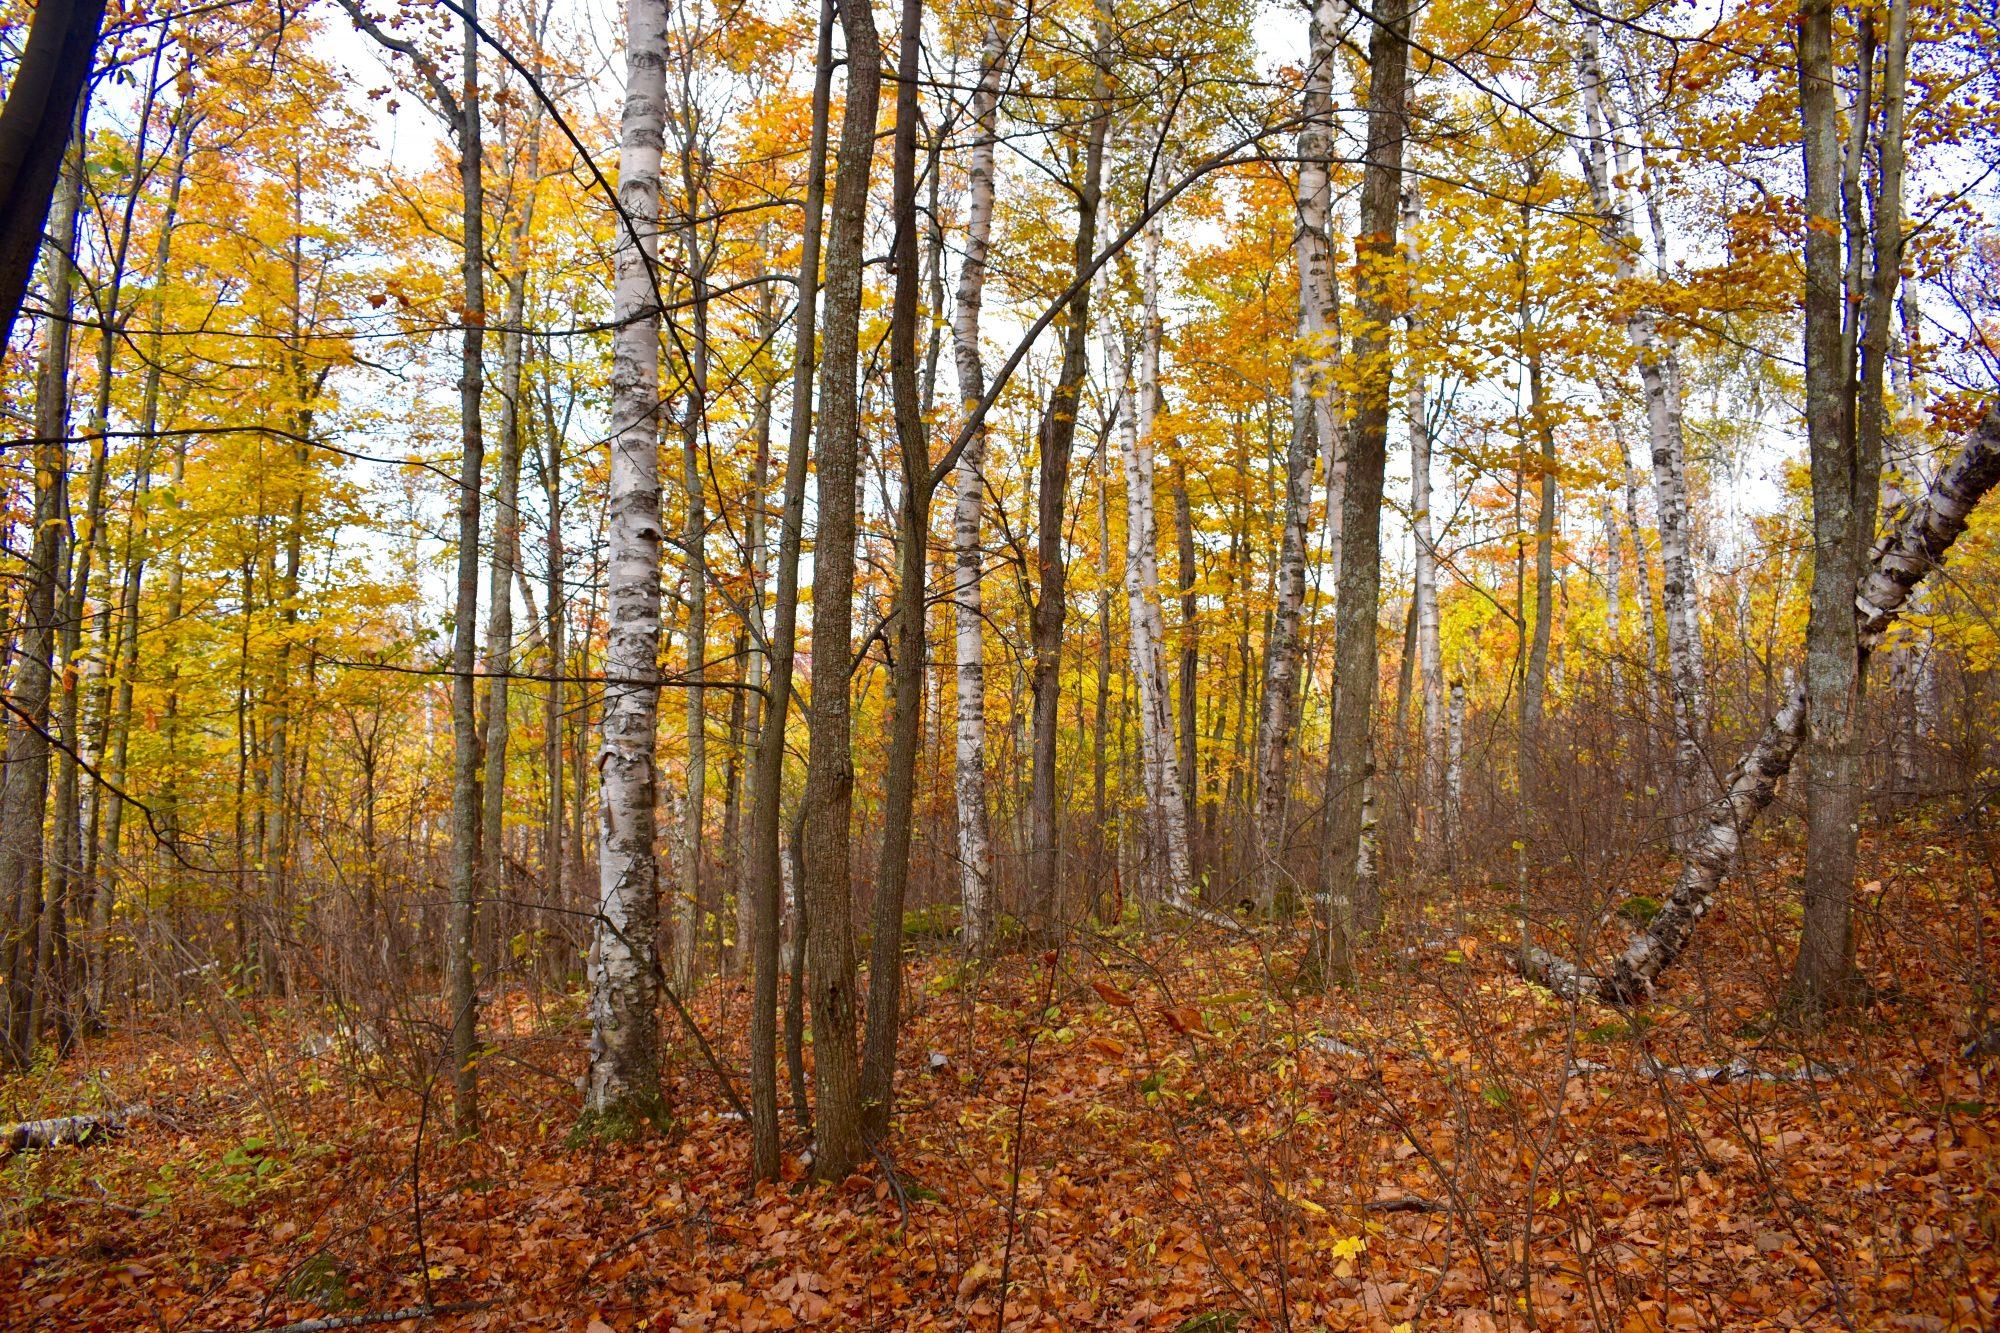 White birch and maple